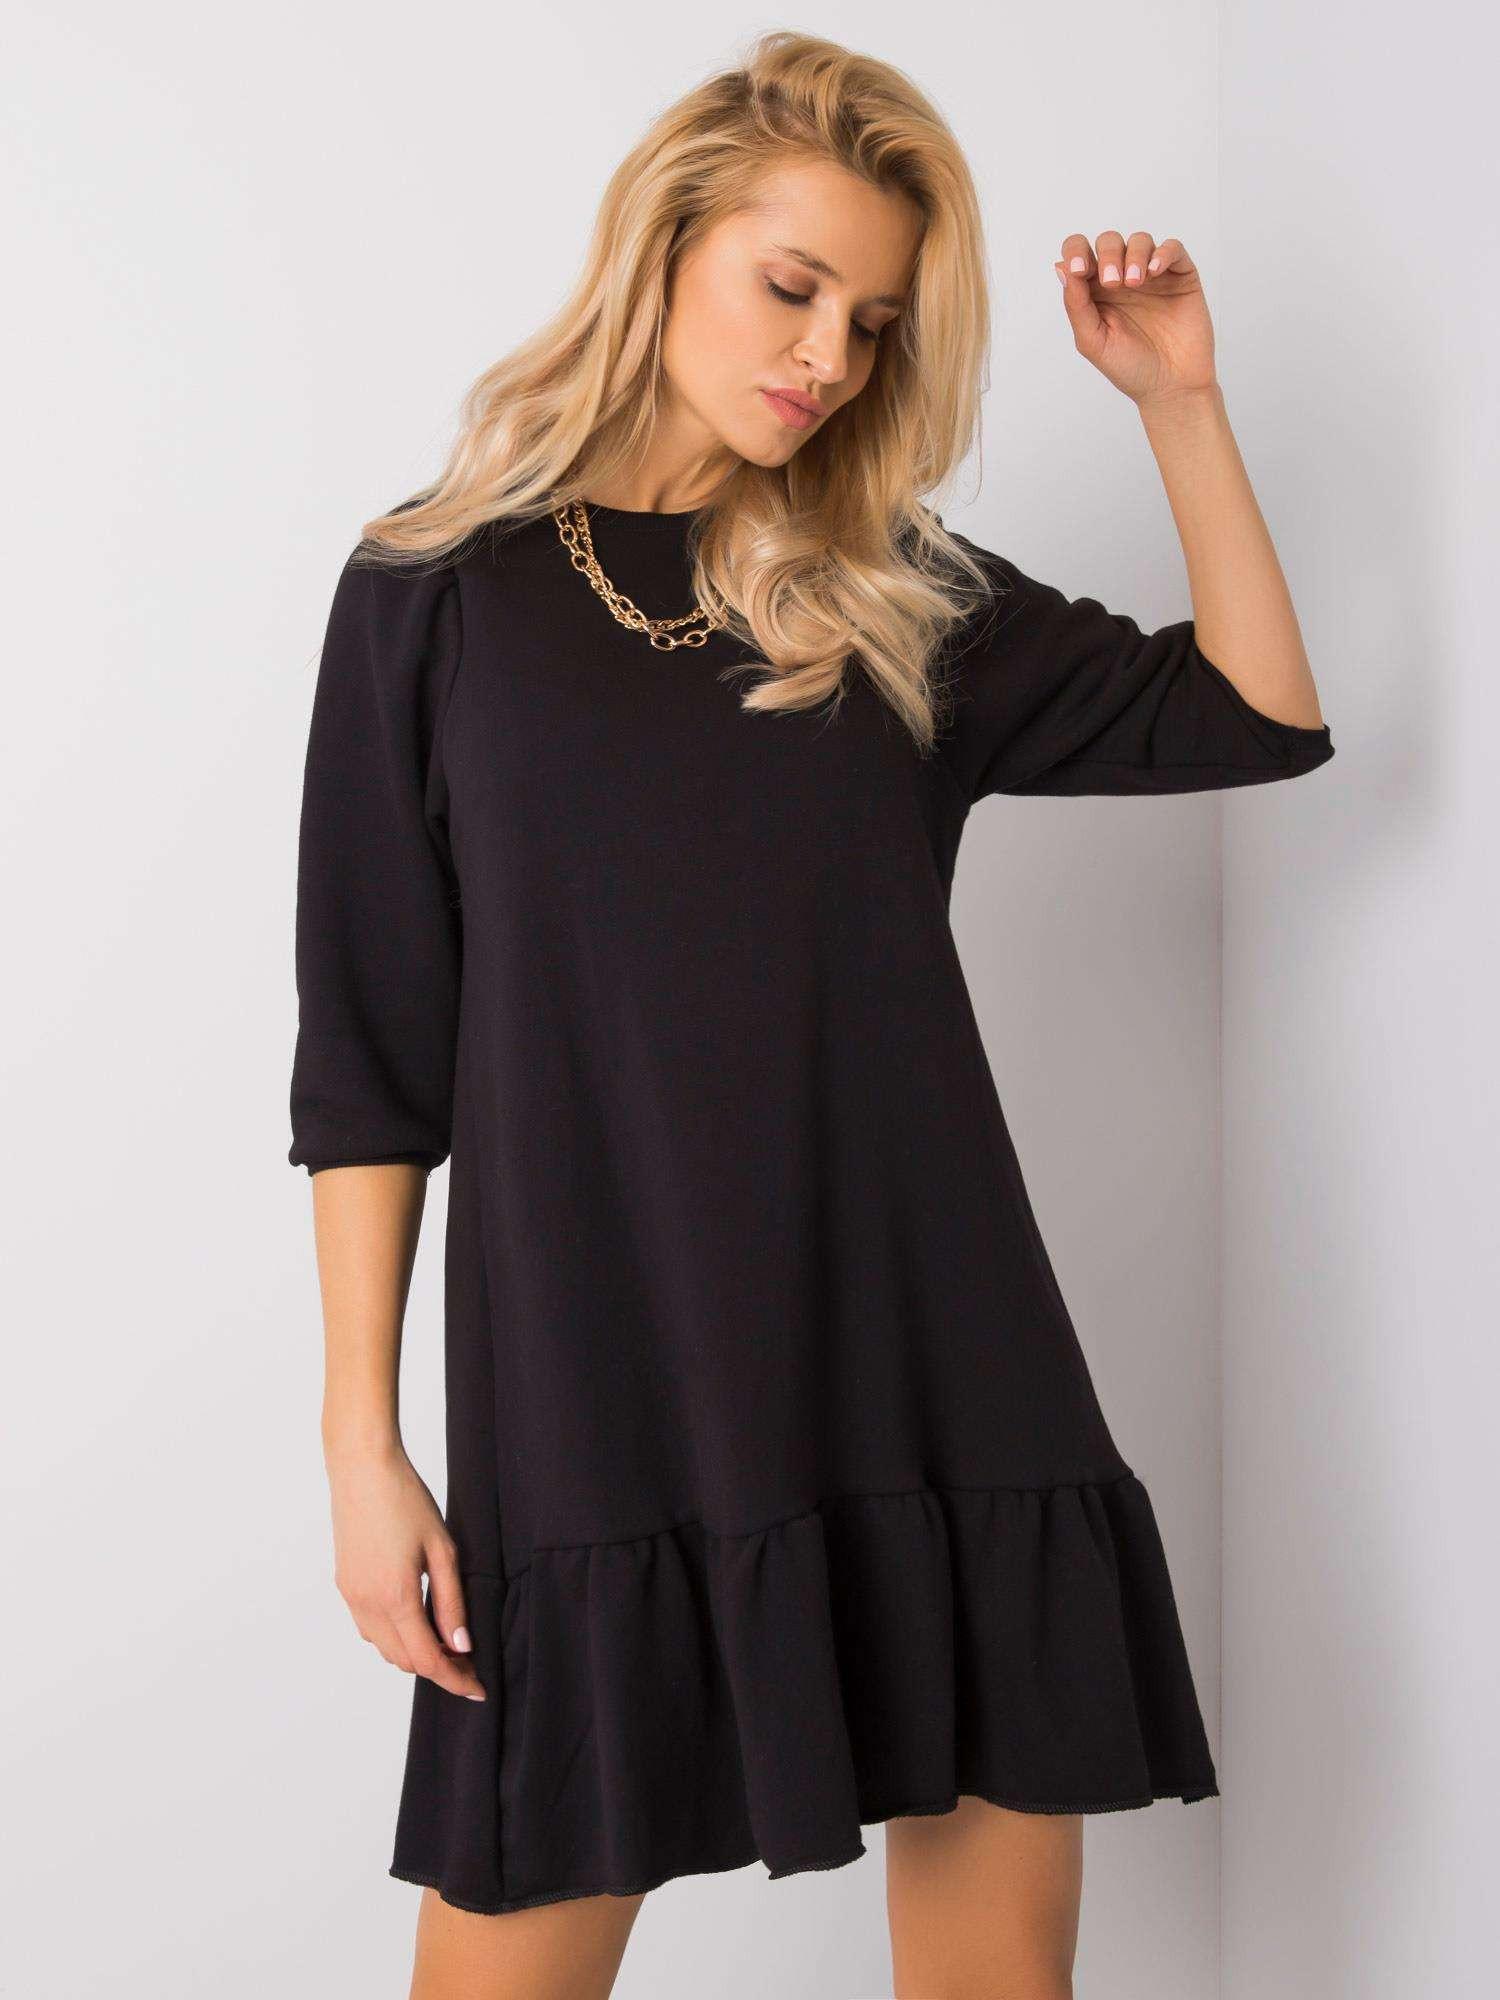 RUE PARIS Čierne šaty s volánikmi S